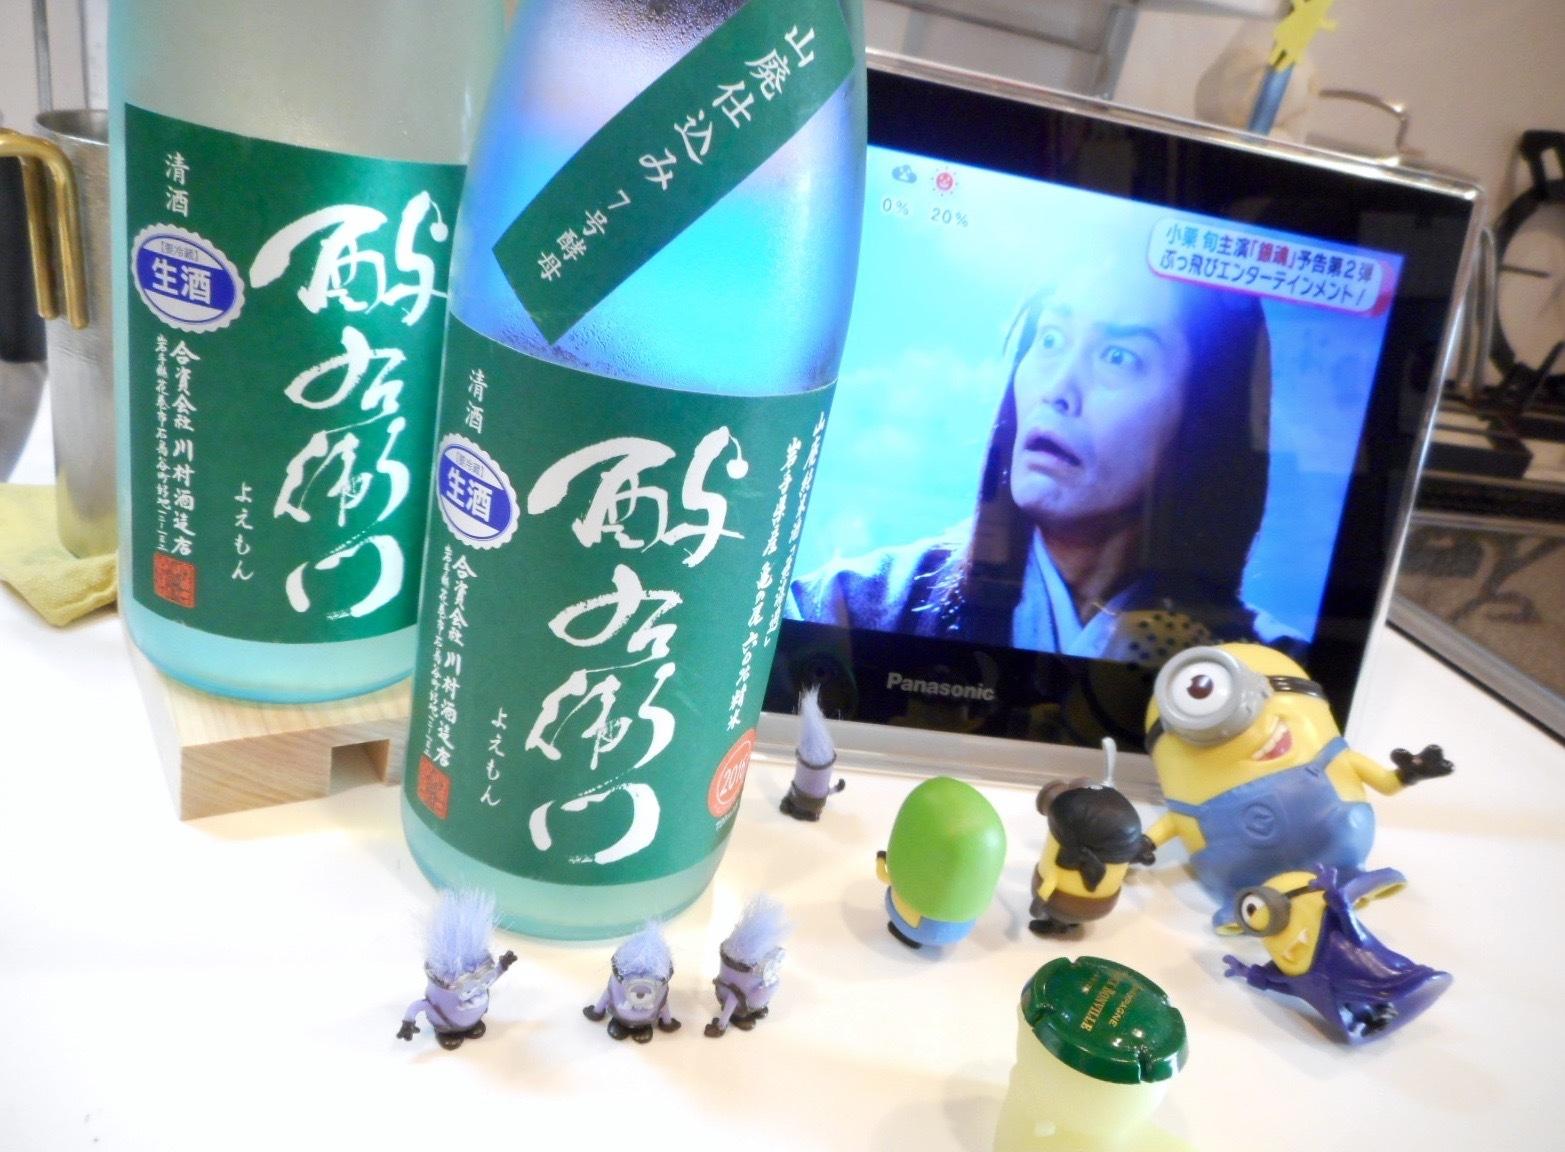 yoemon_kamenoo_yamahai28by1.jpg